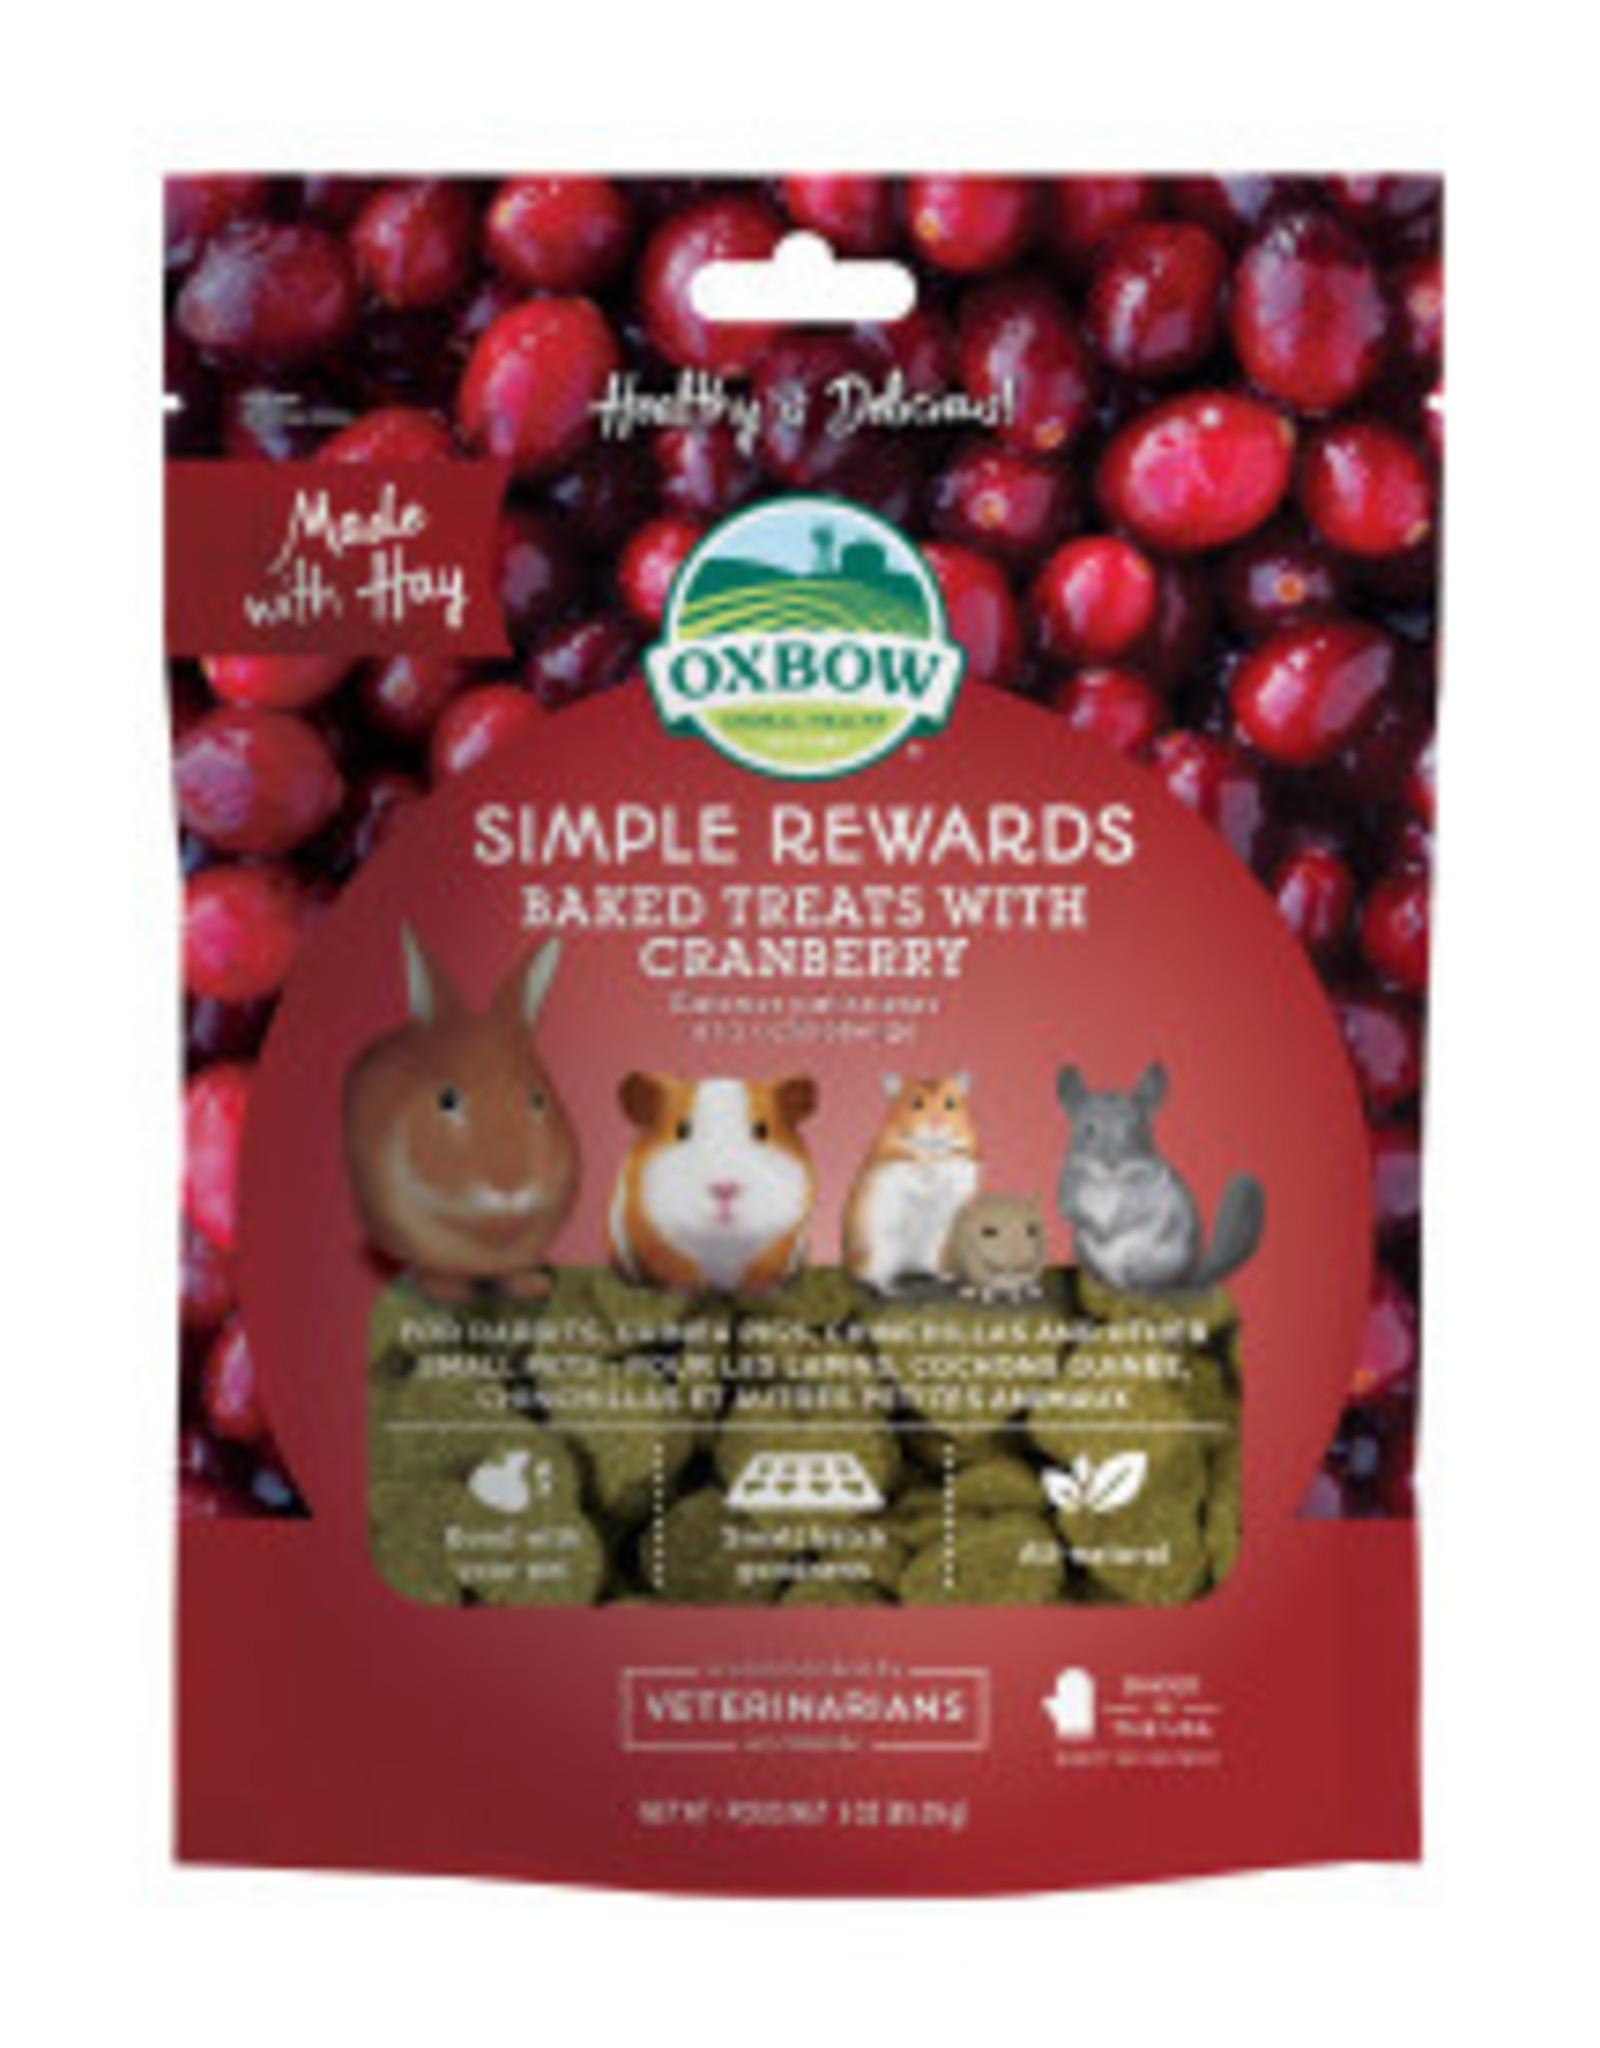 Oxbow Cranberry Baked Treats